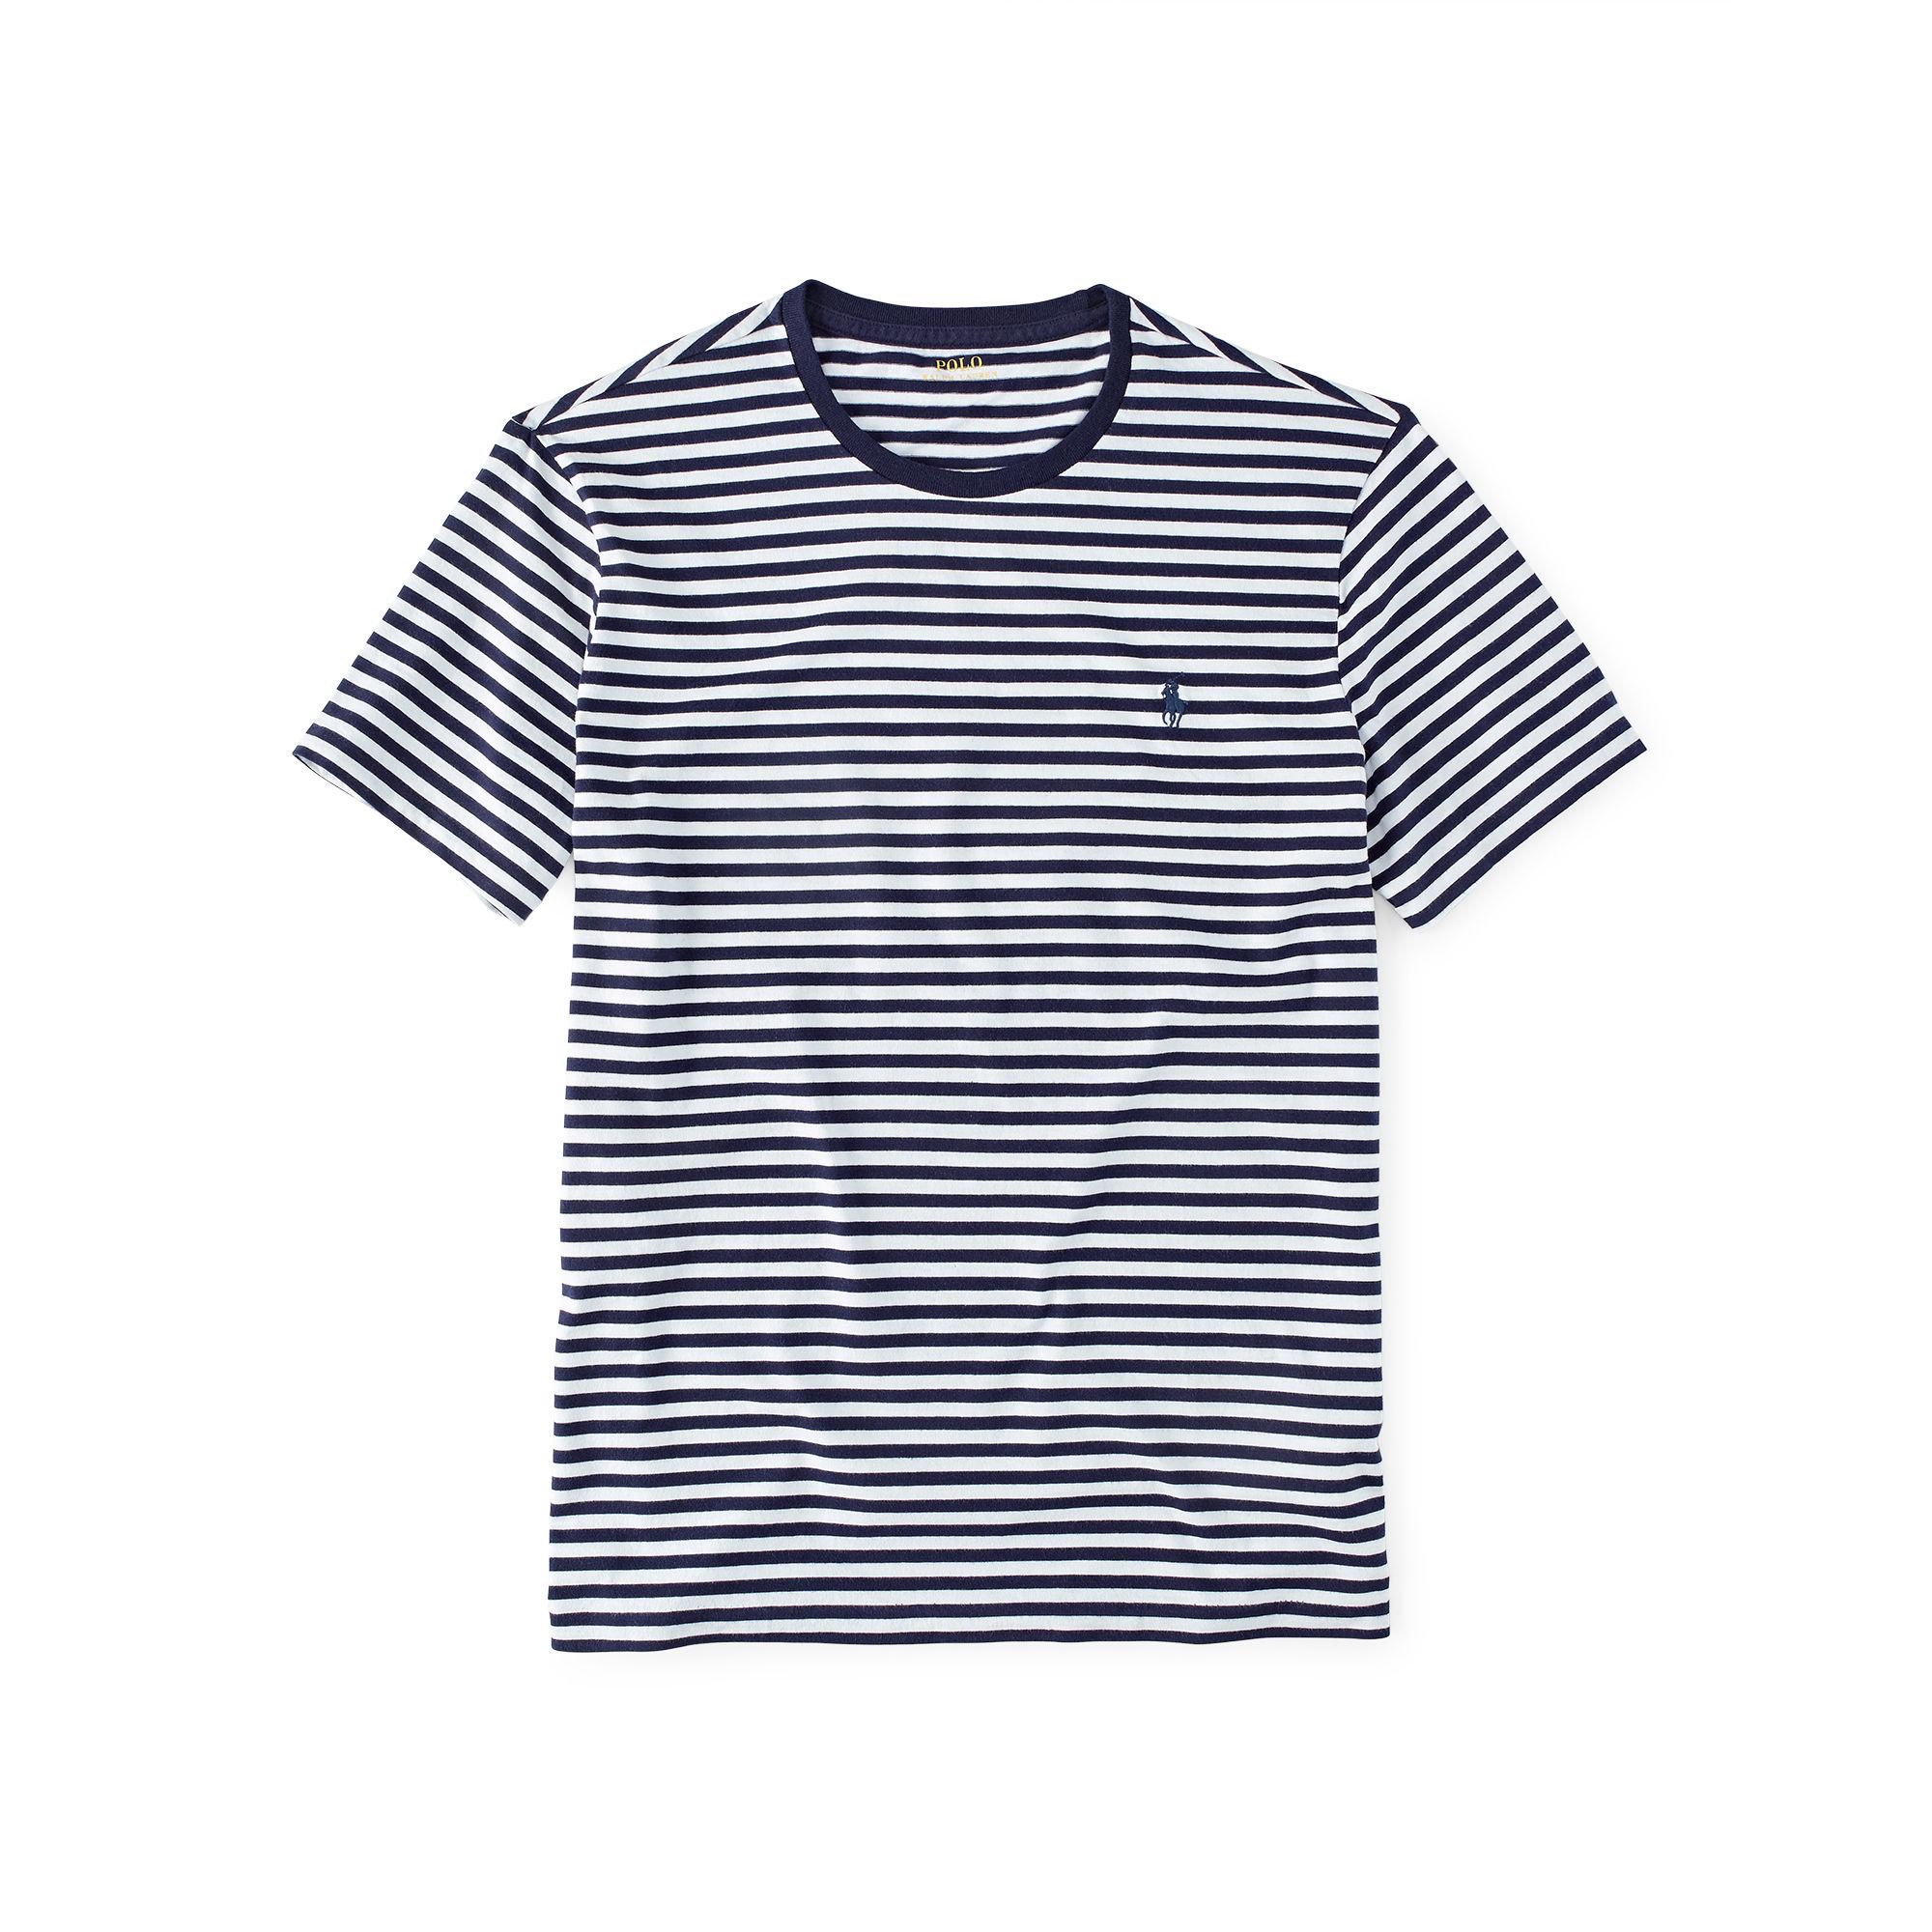 Polo ralph lauren custom fit striped t shirt in blue for for Polo custom fit t shirts